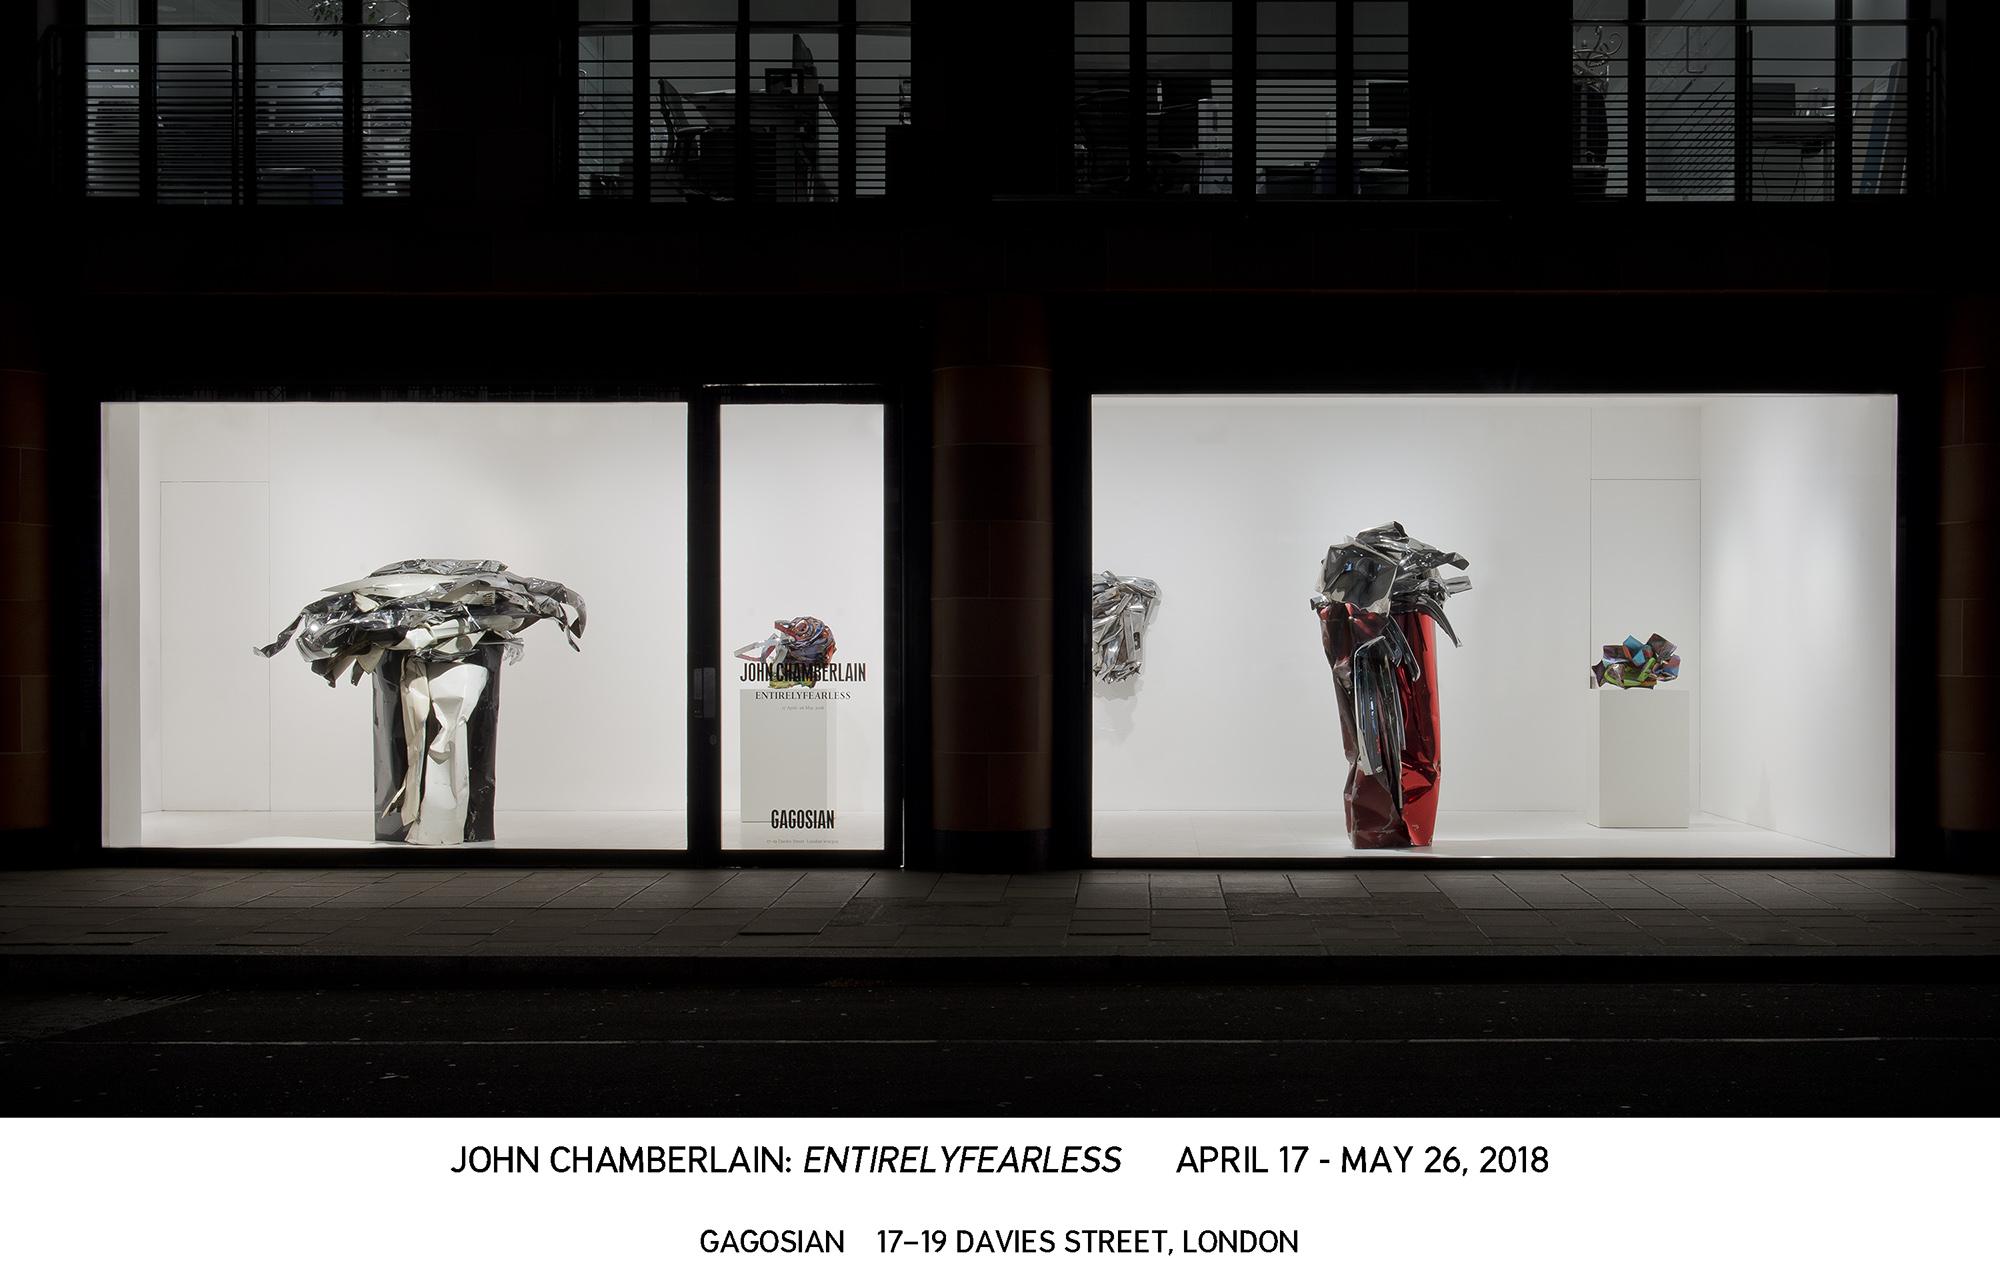 CHAMBERLAIN 2018 ENTIRELYFEARLESS Exterior view 1.jpg